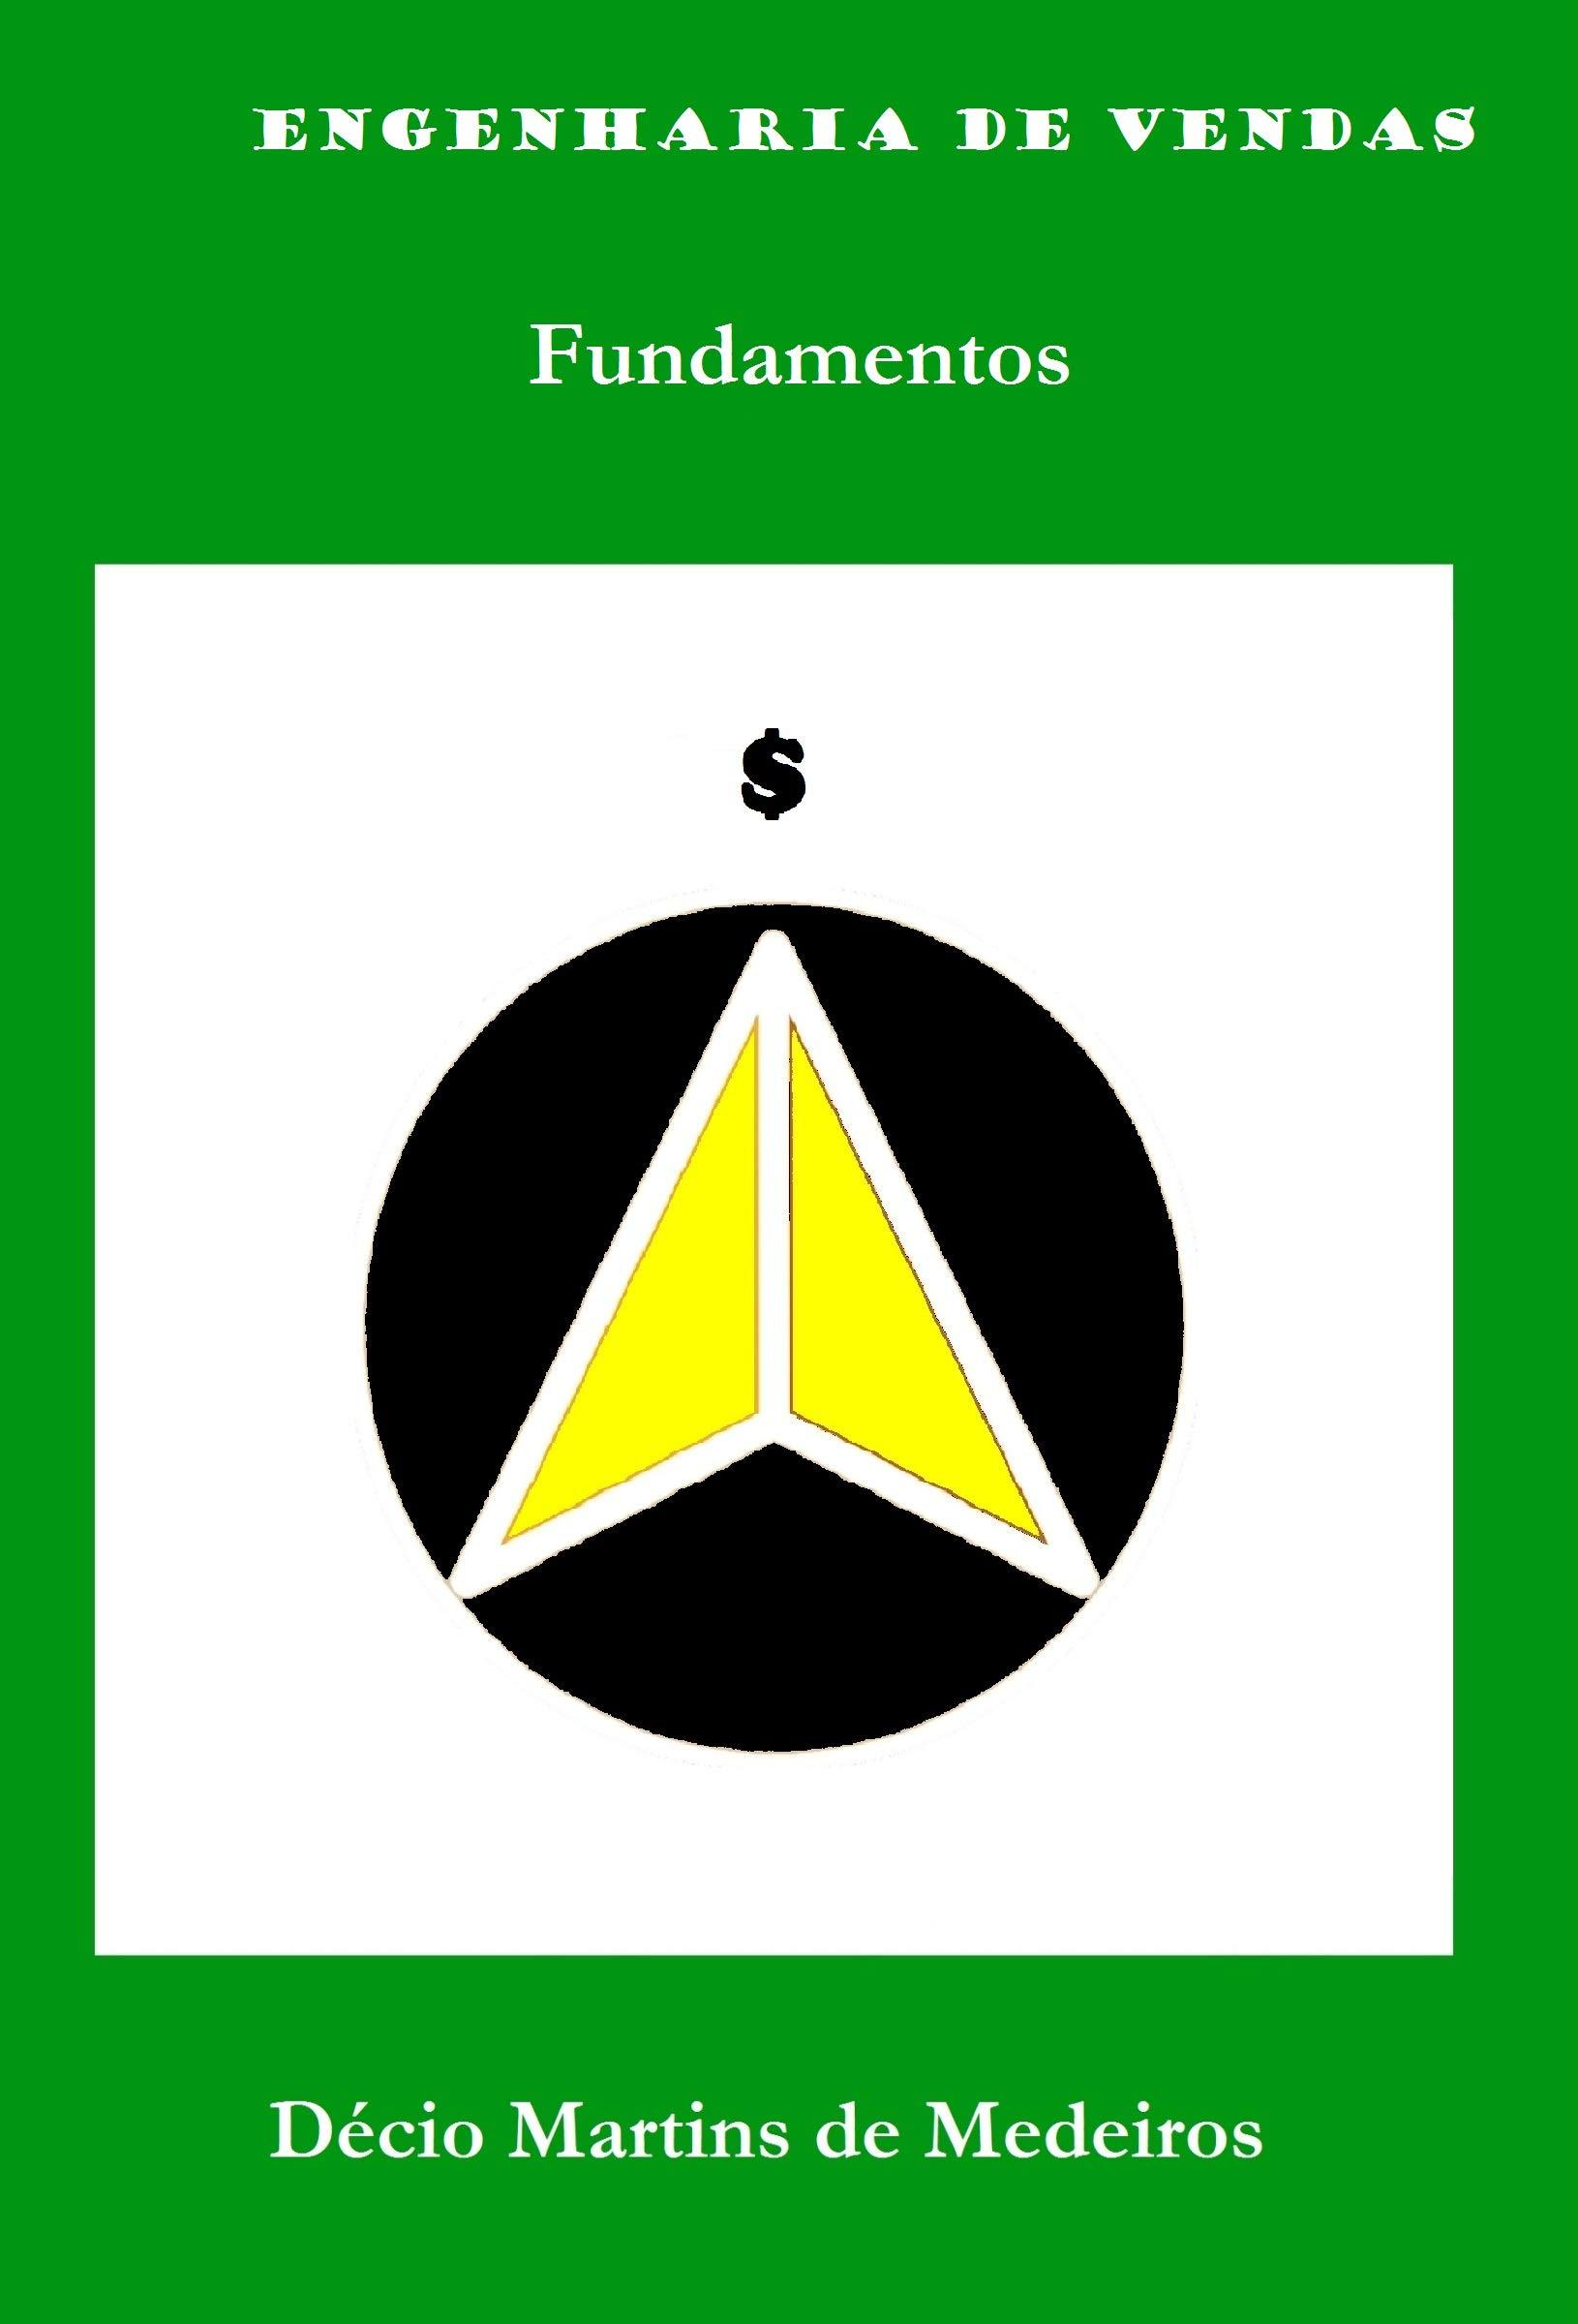 Engenharia de Vendas: Fundamentos (Portuguese Edition)